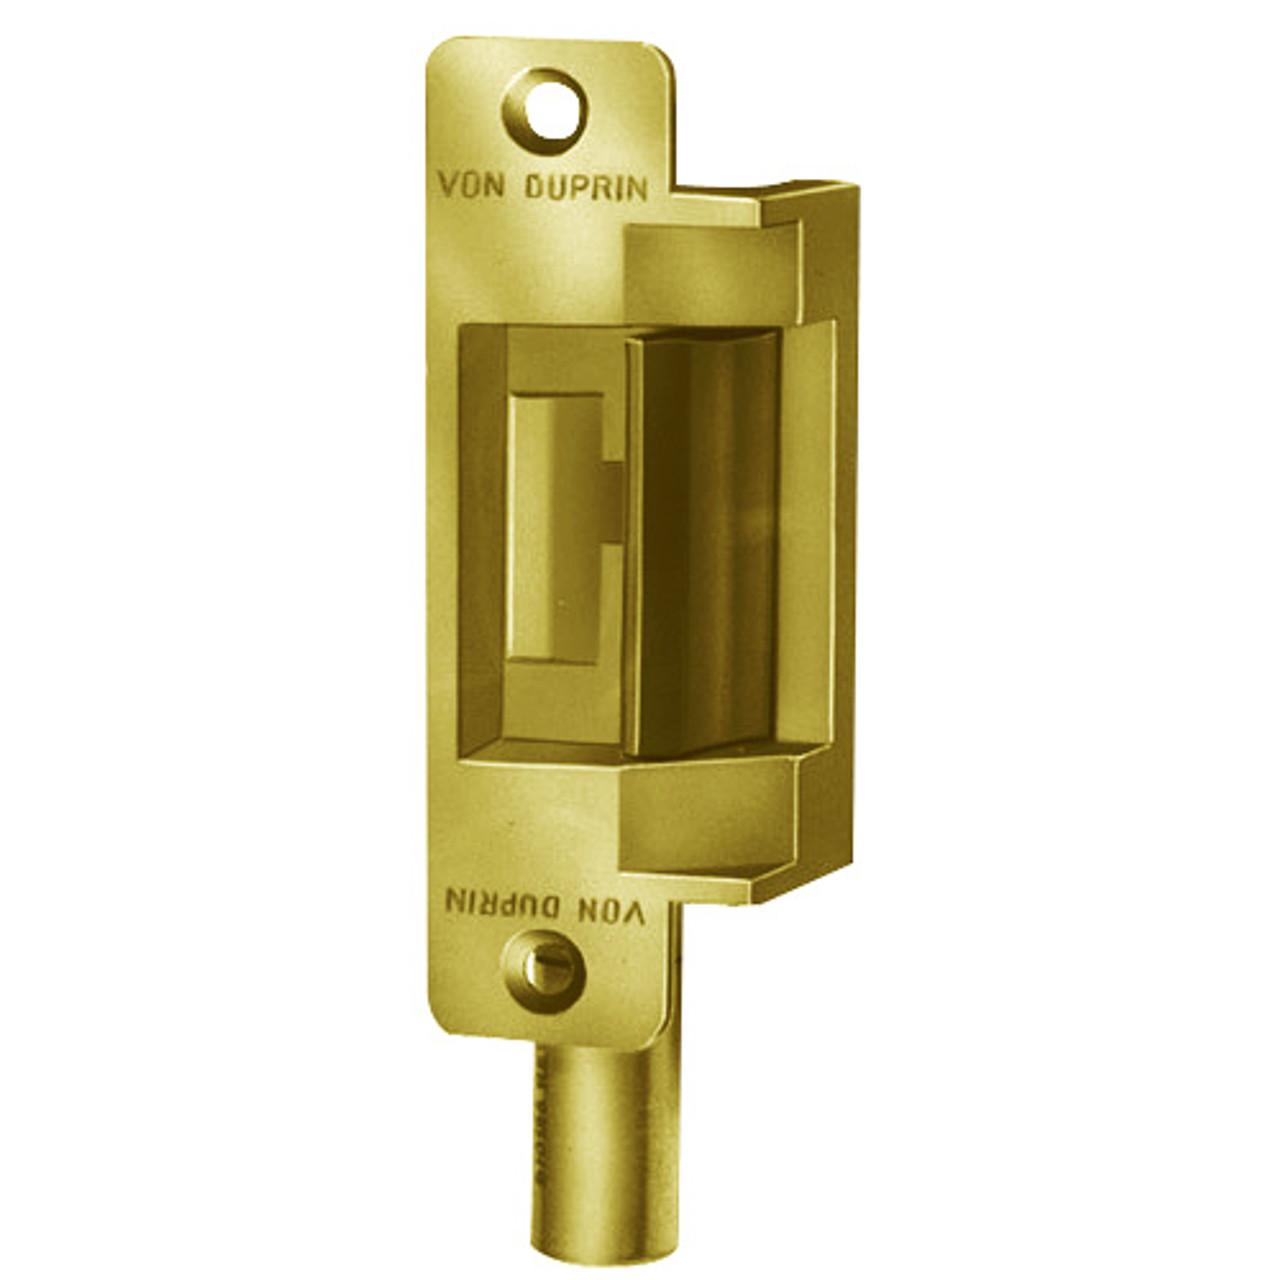 6211AL-12VDC-US3 Von Duprin Electric Strike in Bright Brass Finish